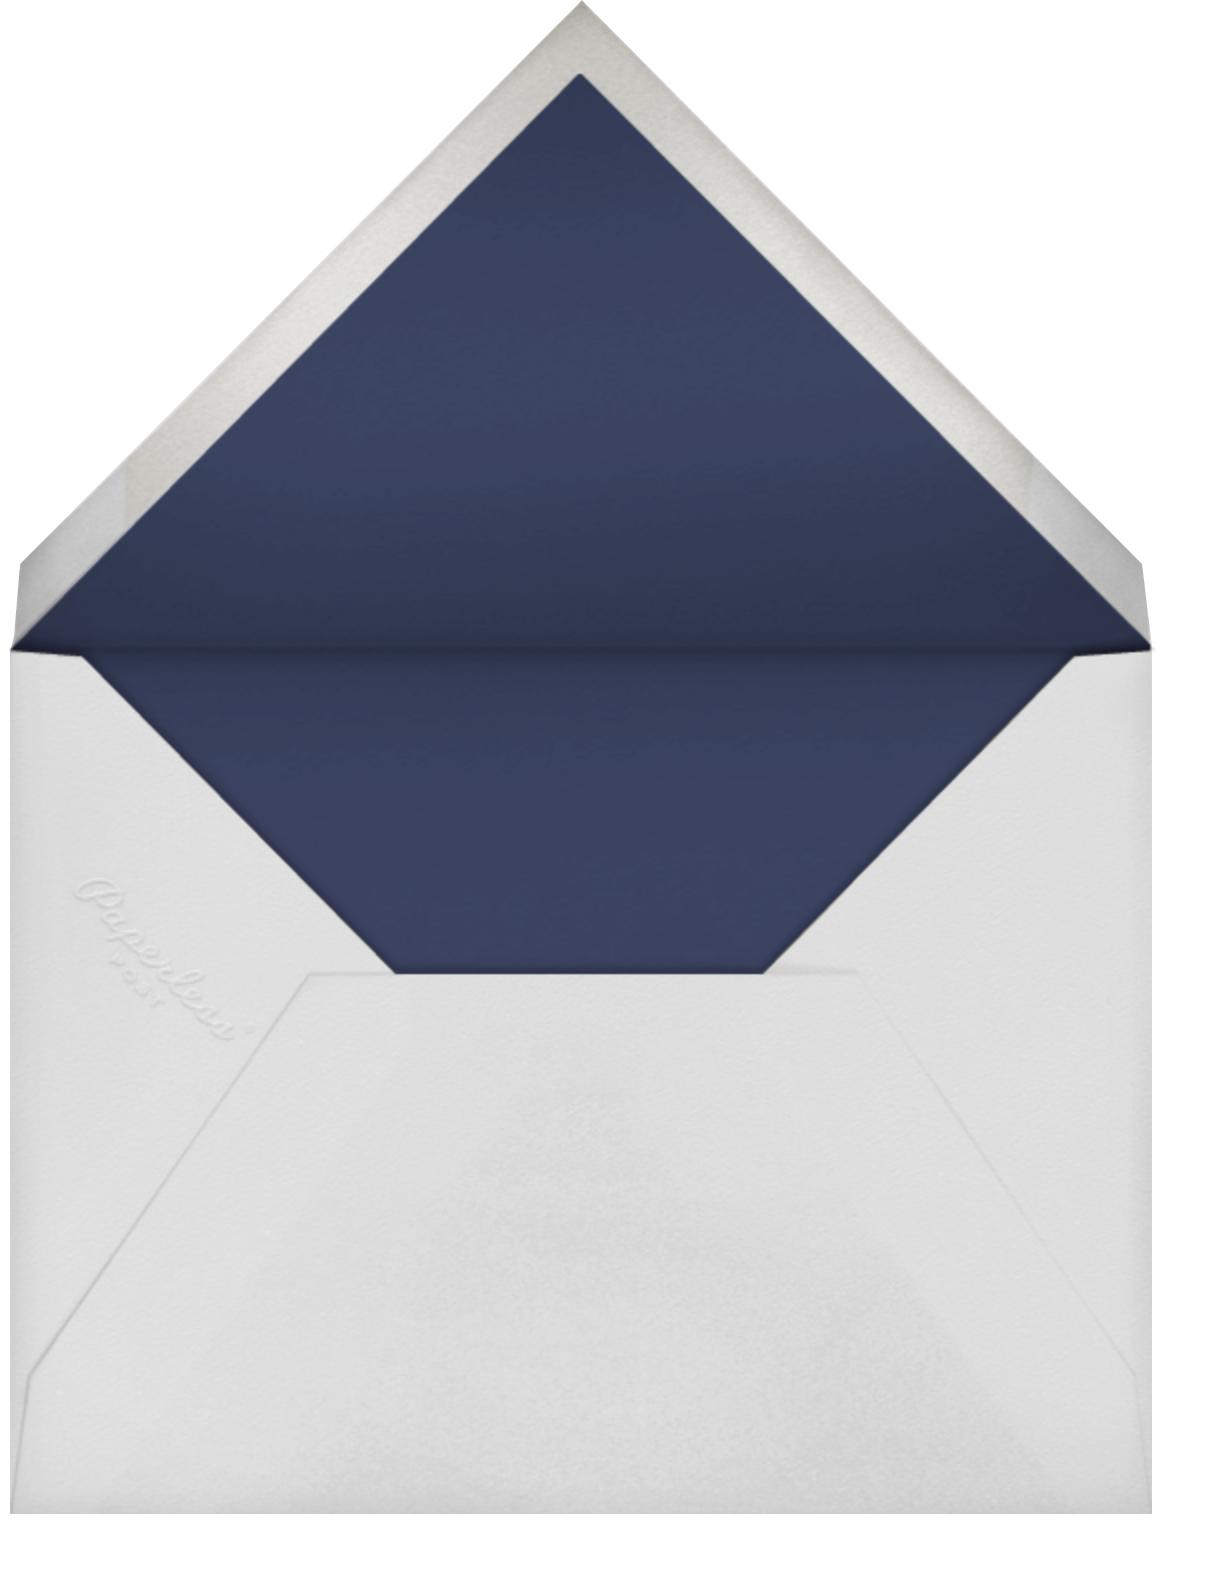 Royal Botanical - White - Oscar de la Renta - Baby shower - envelope back